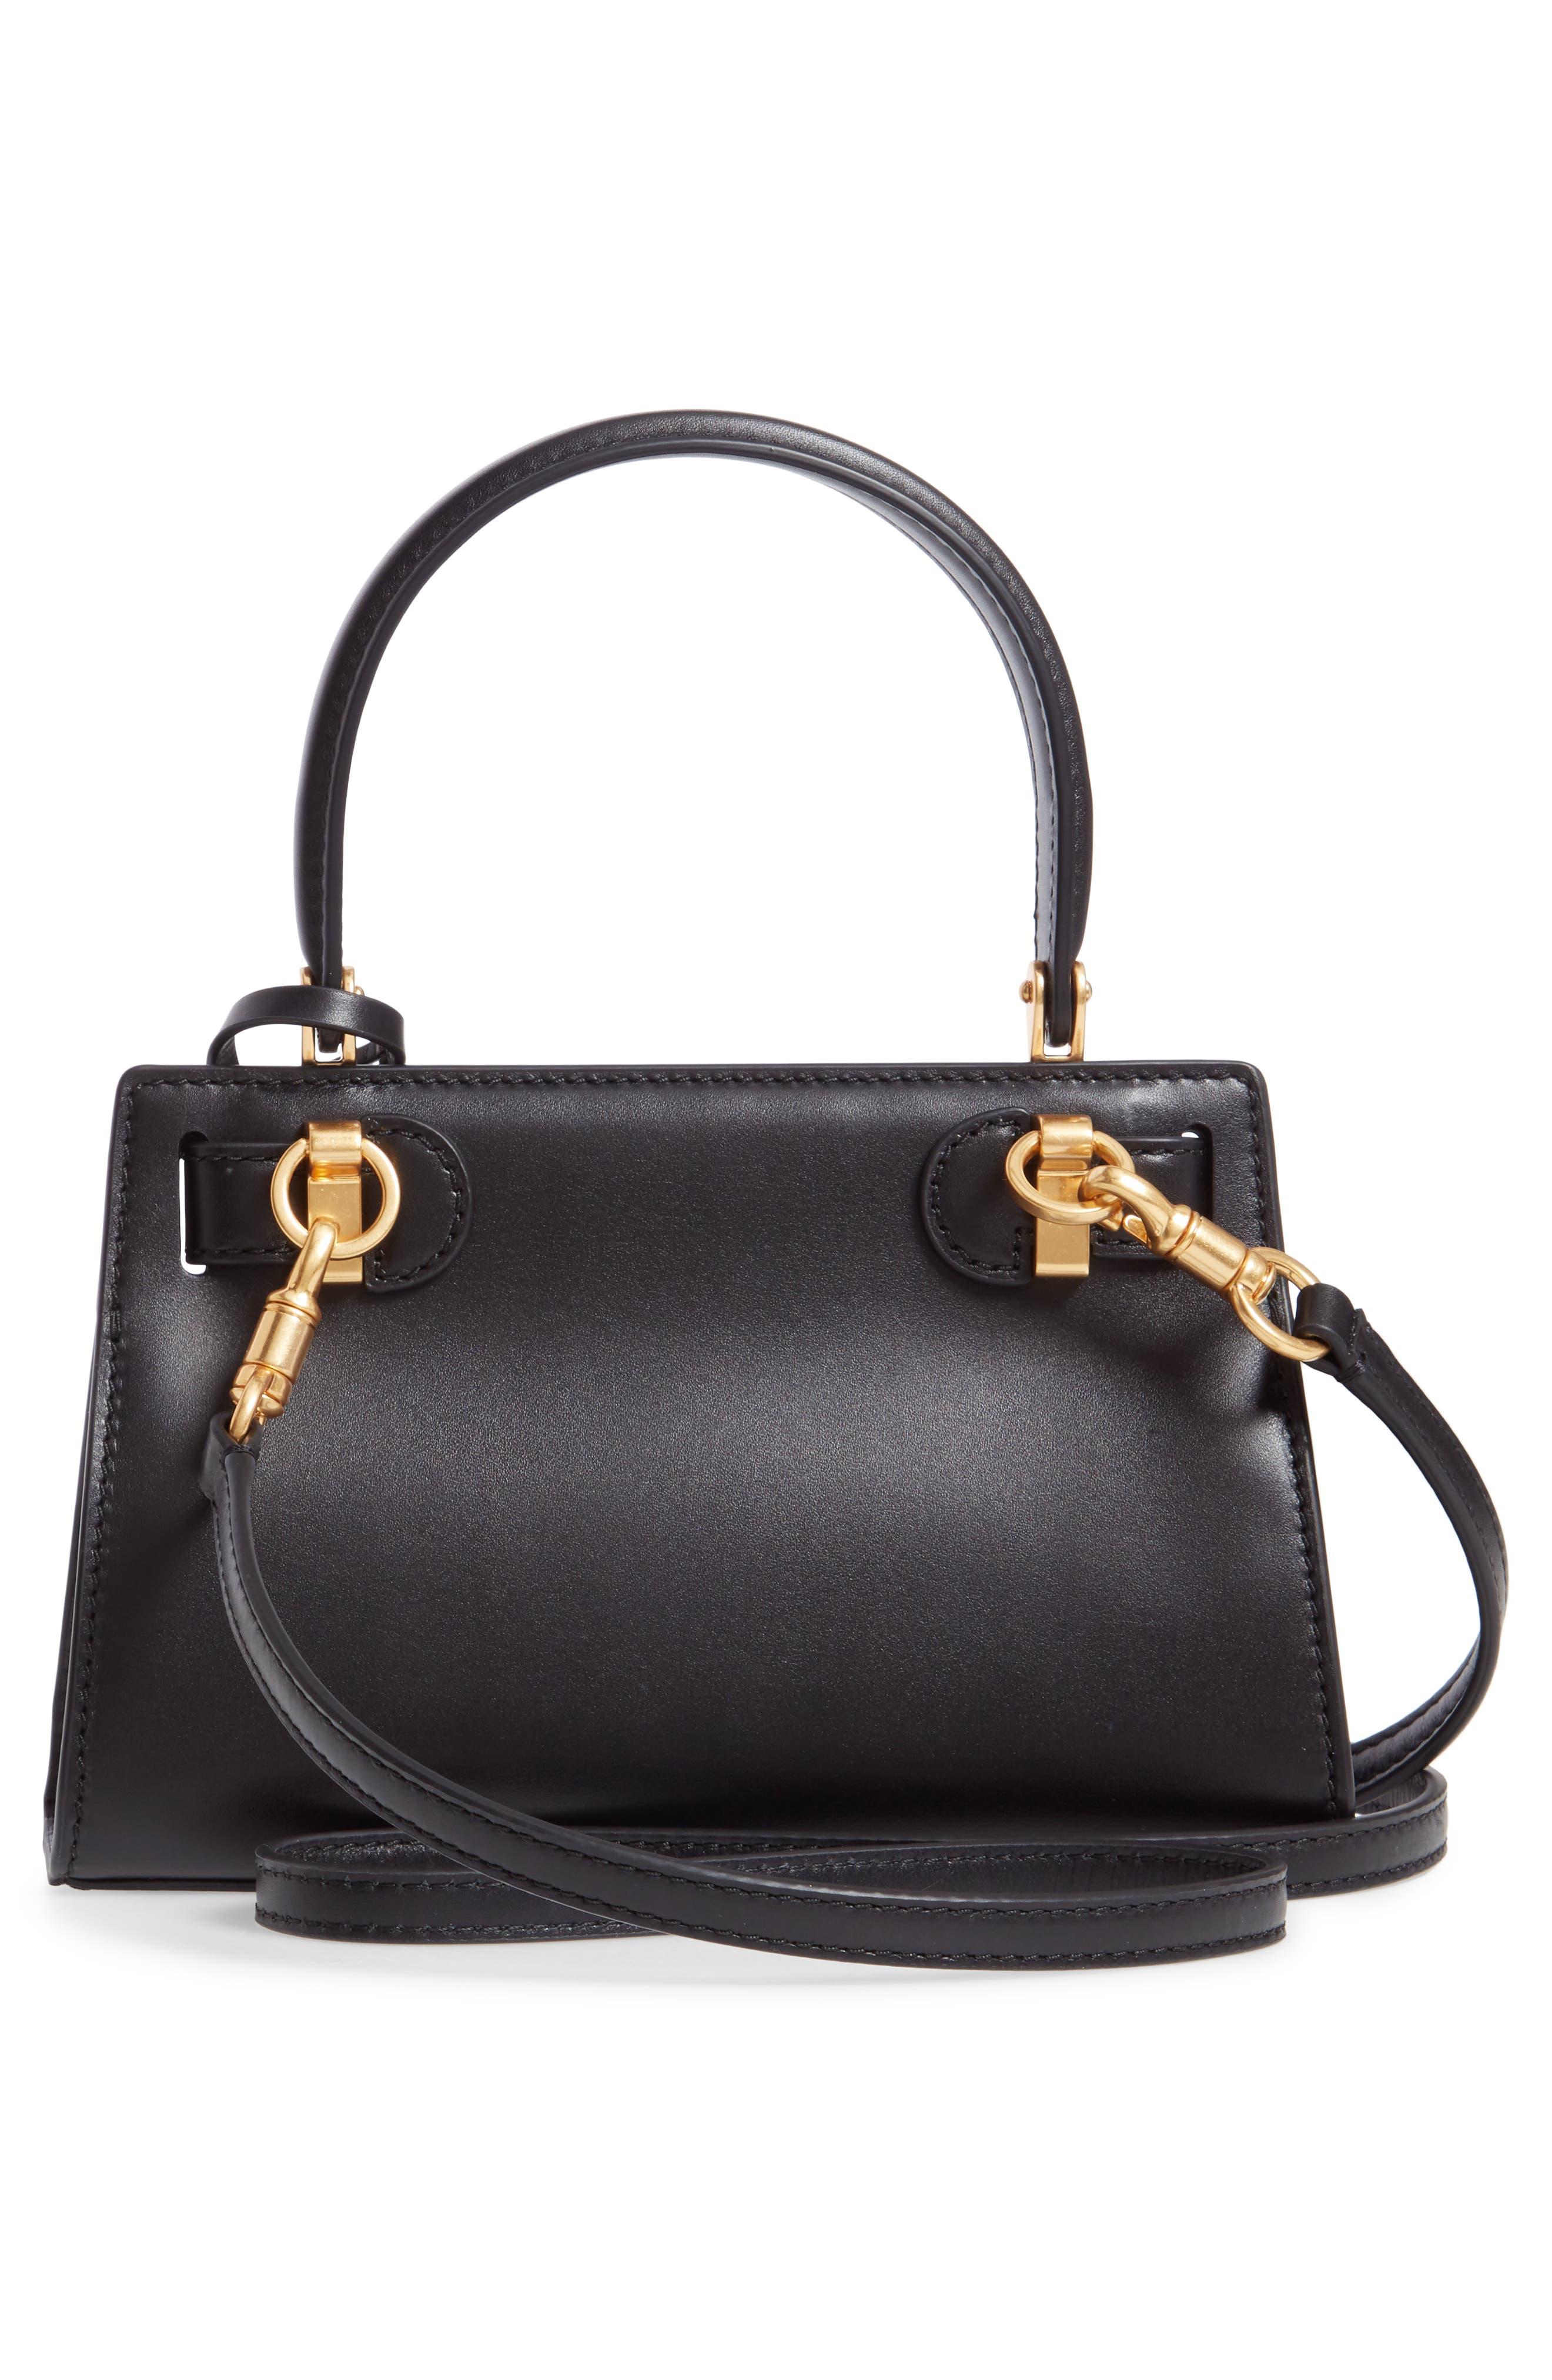 TORY BURCH, Mini Lee Radziwill Leather Bag, Alternate thumbnail 3, color, BLACK